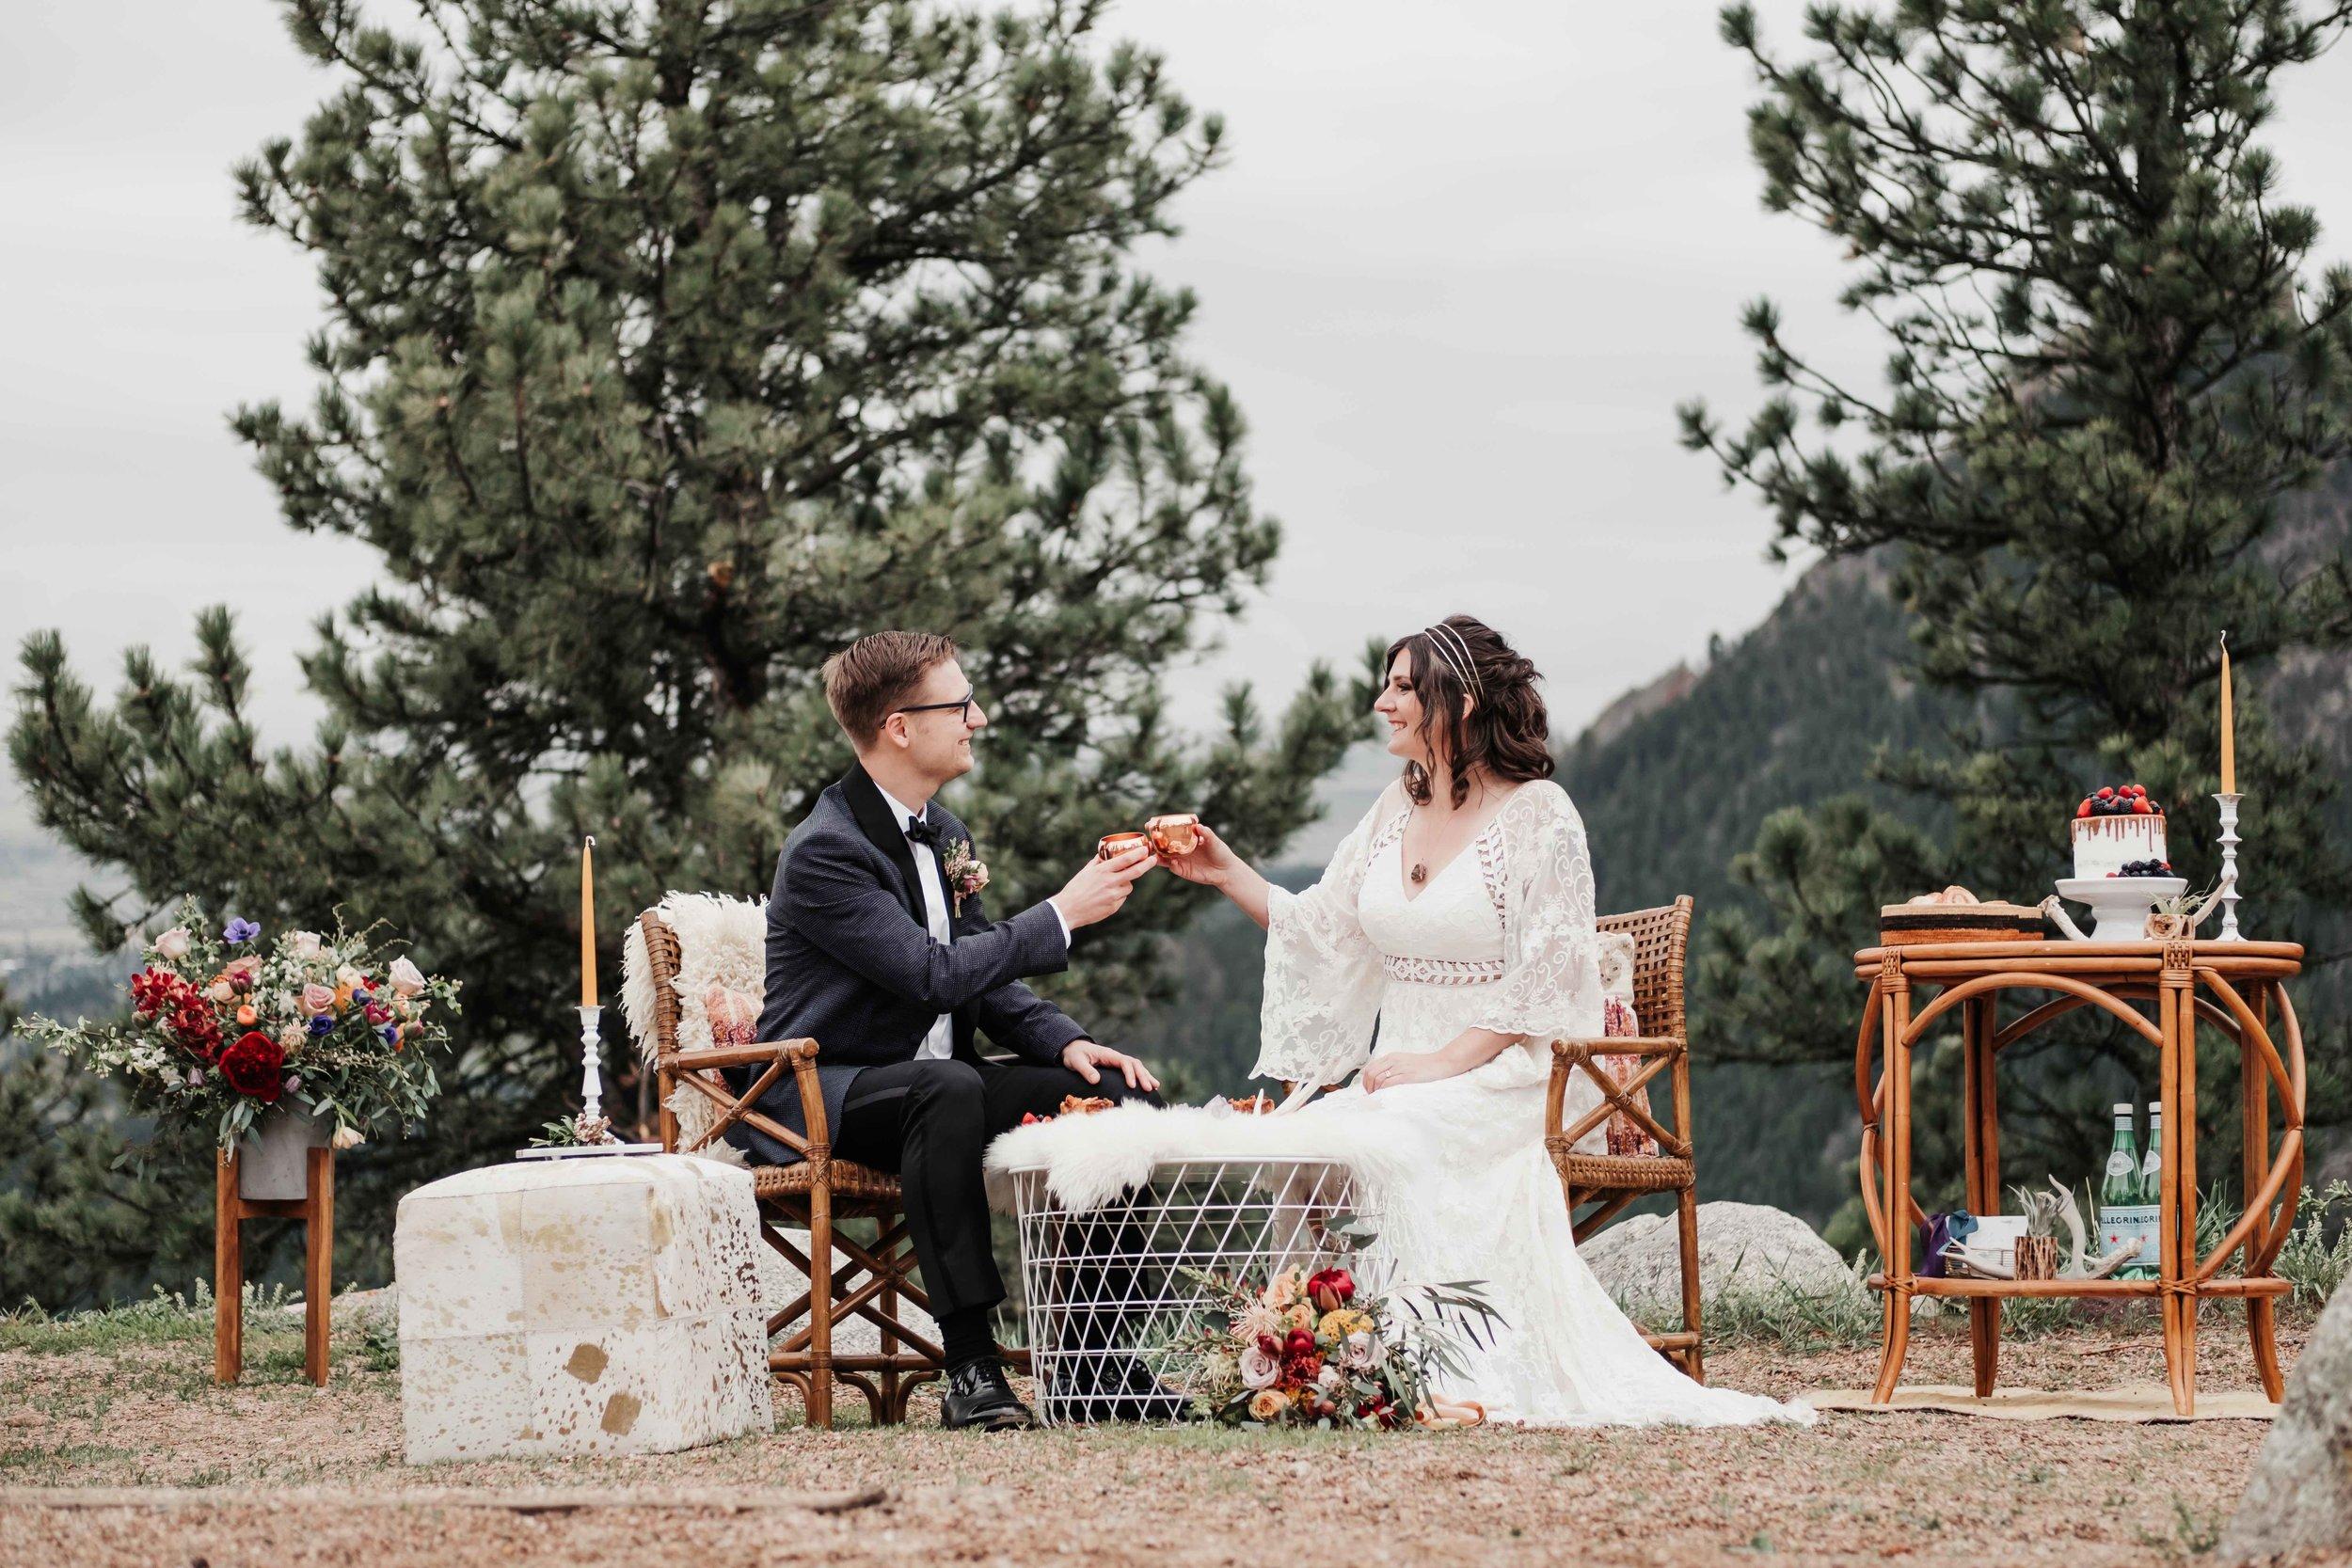 Sunrise Amphitheater Wedding Ceremony Brunch